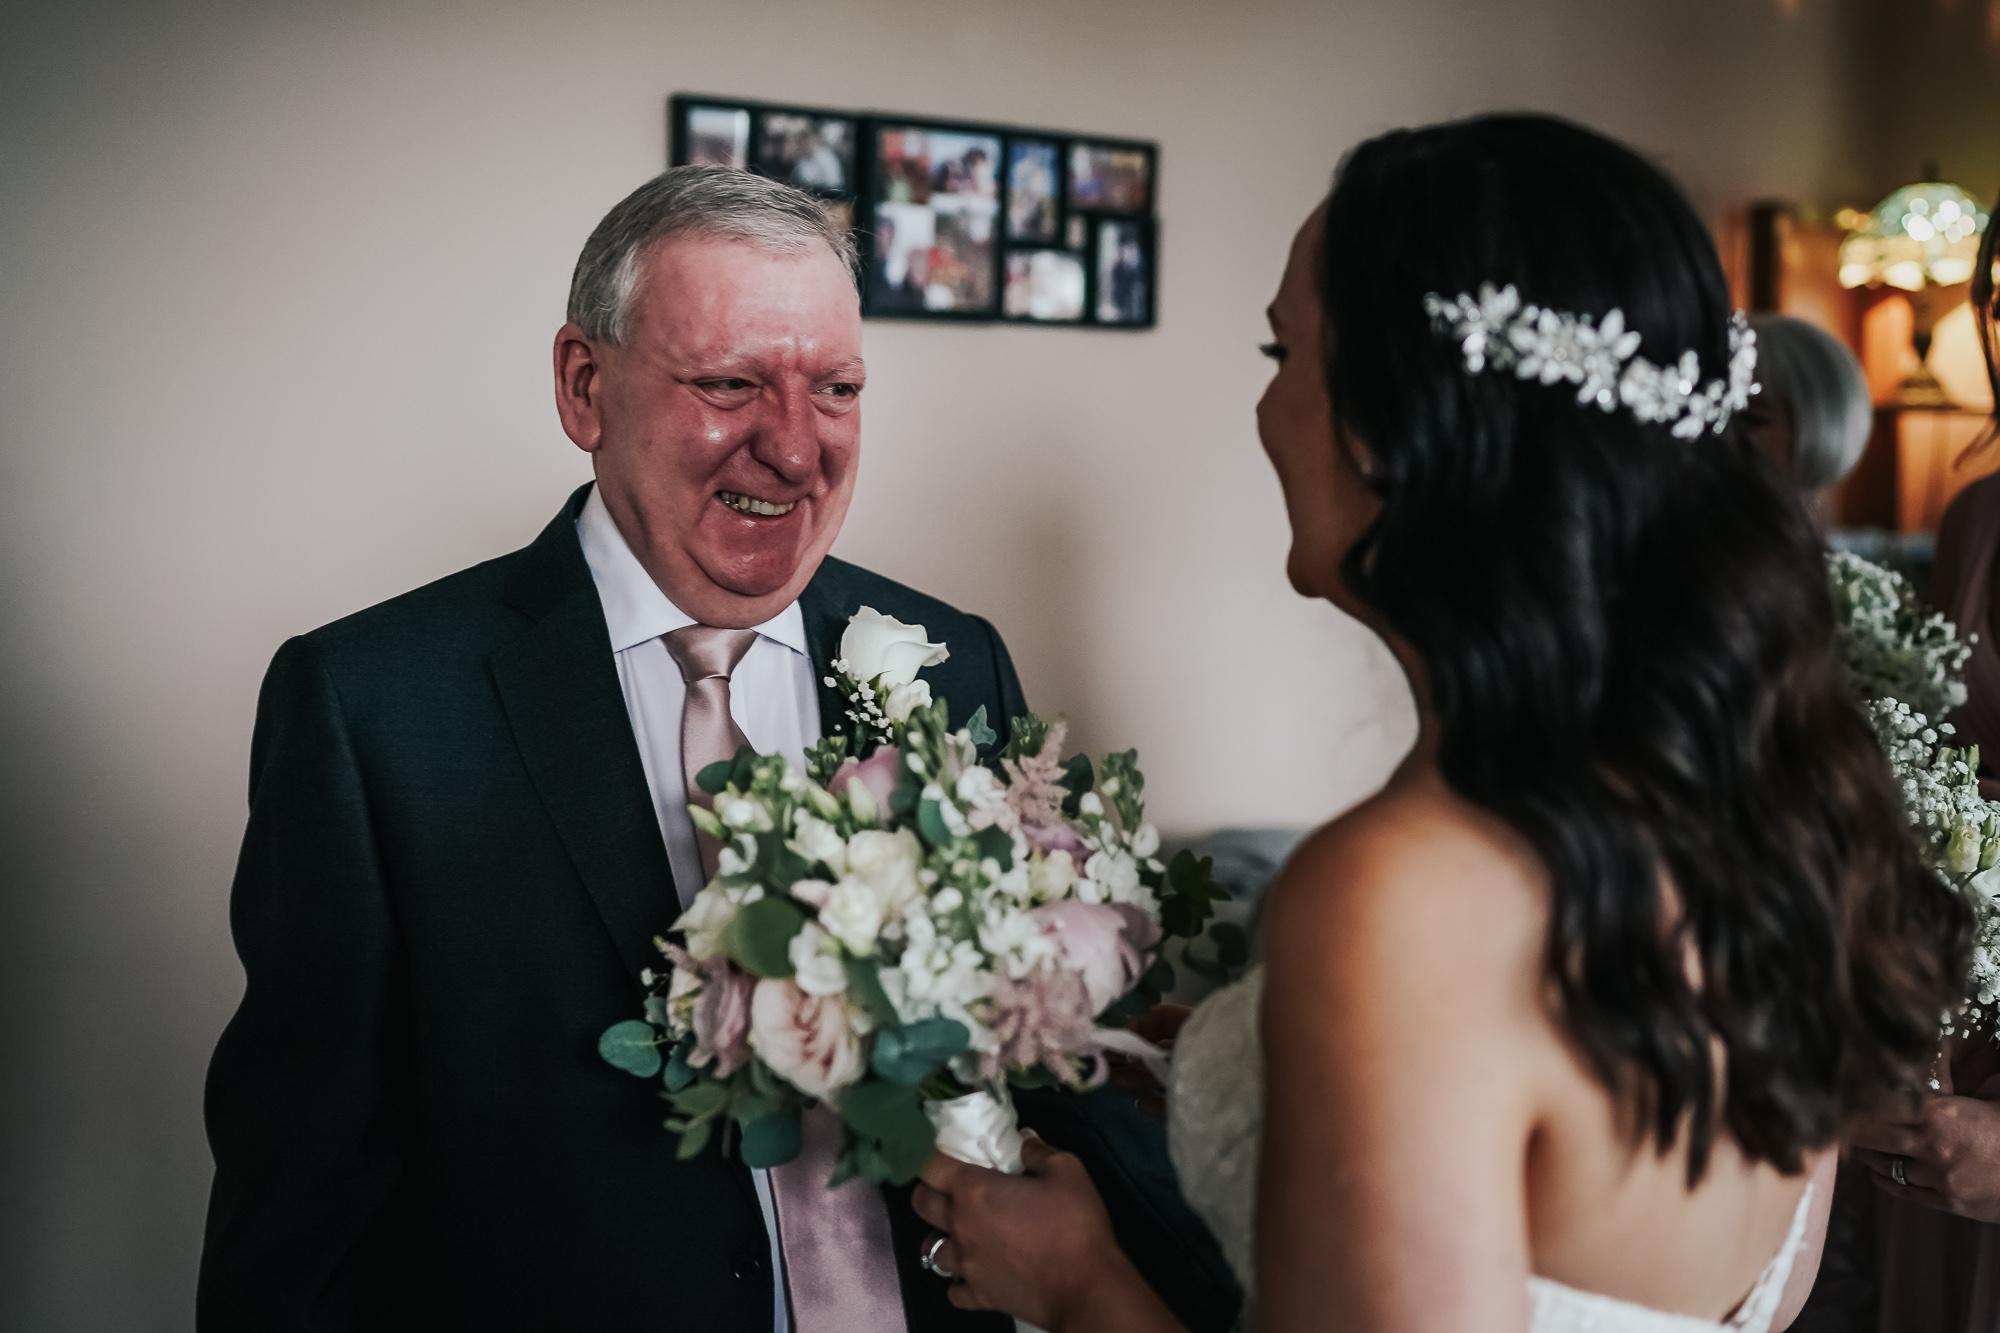 Hyde Bank Farm Wedding Photography Manchester wedding photographer (12 of 49).jpg